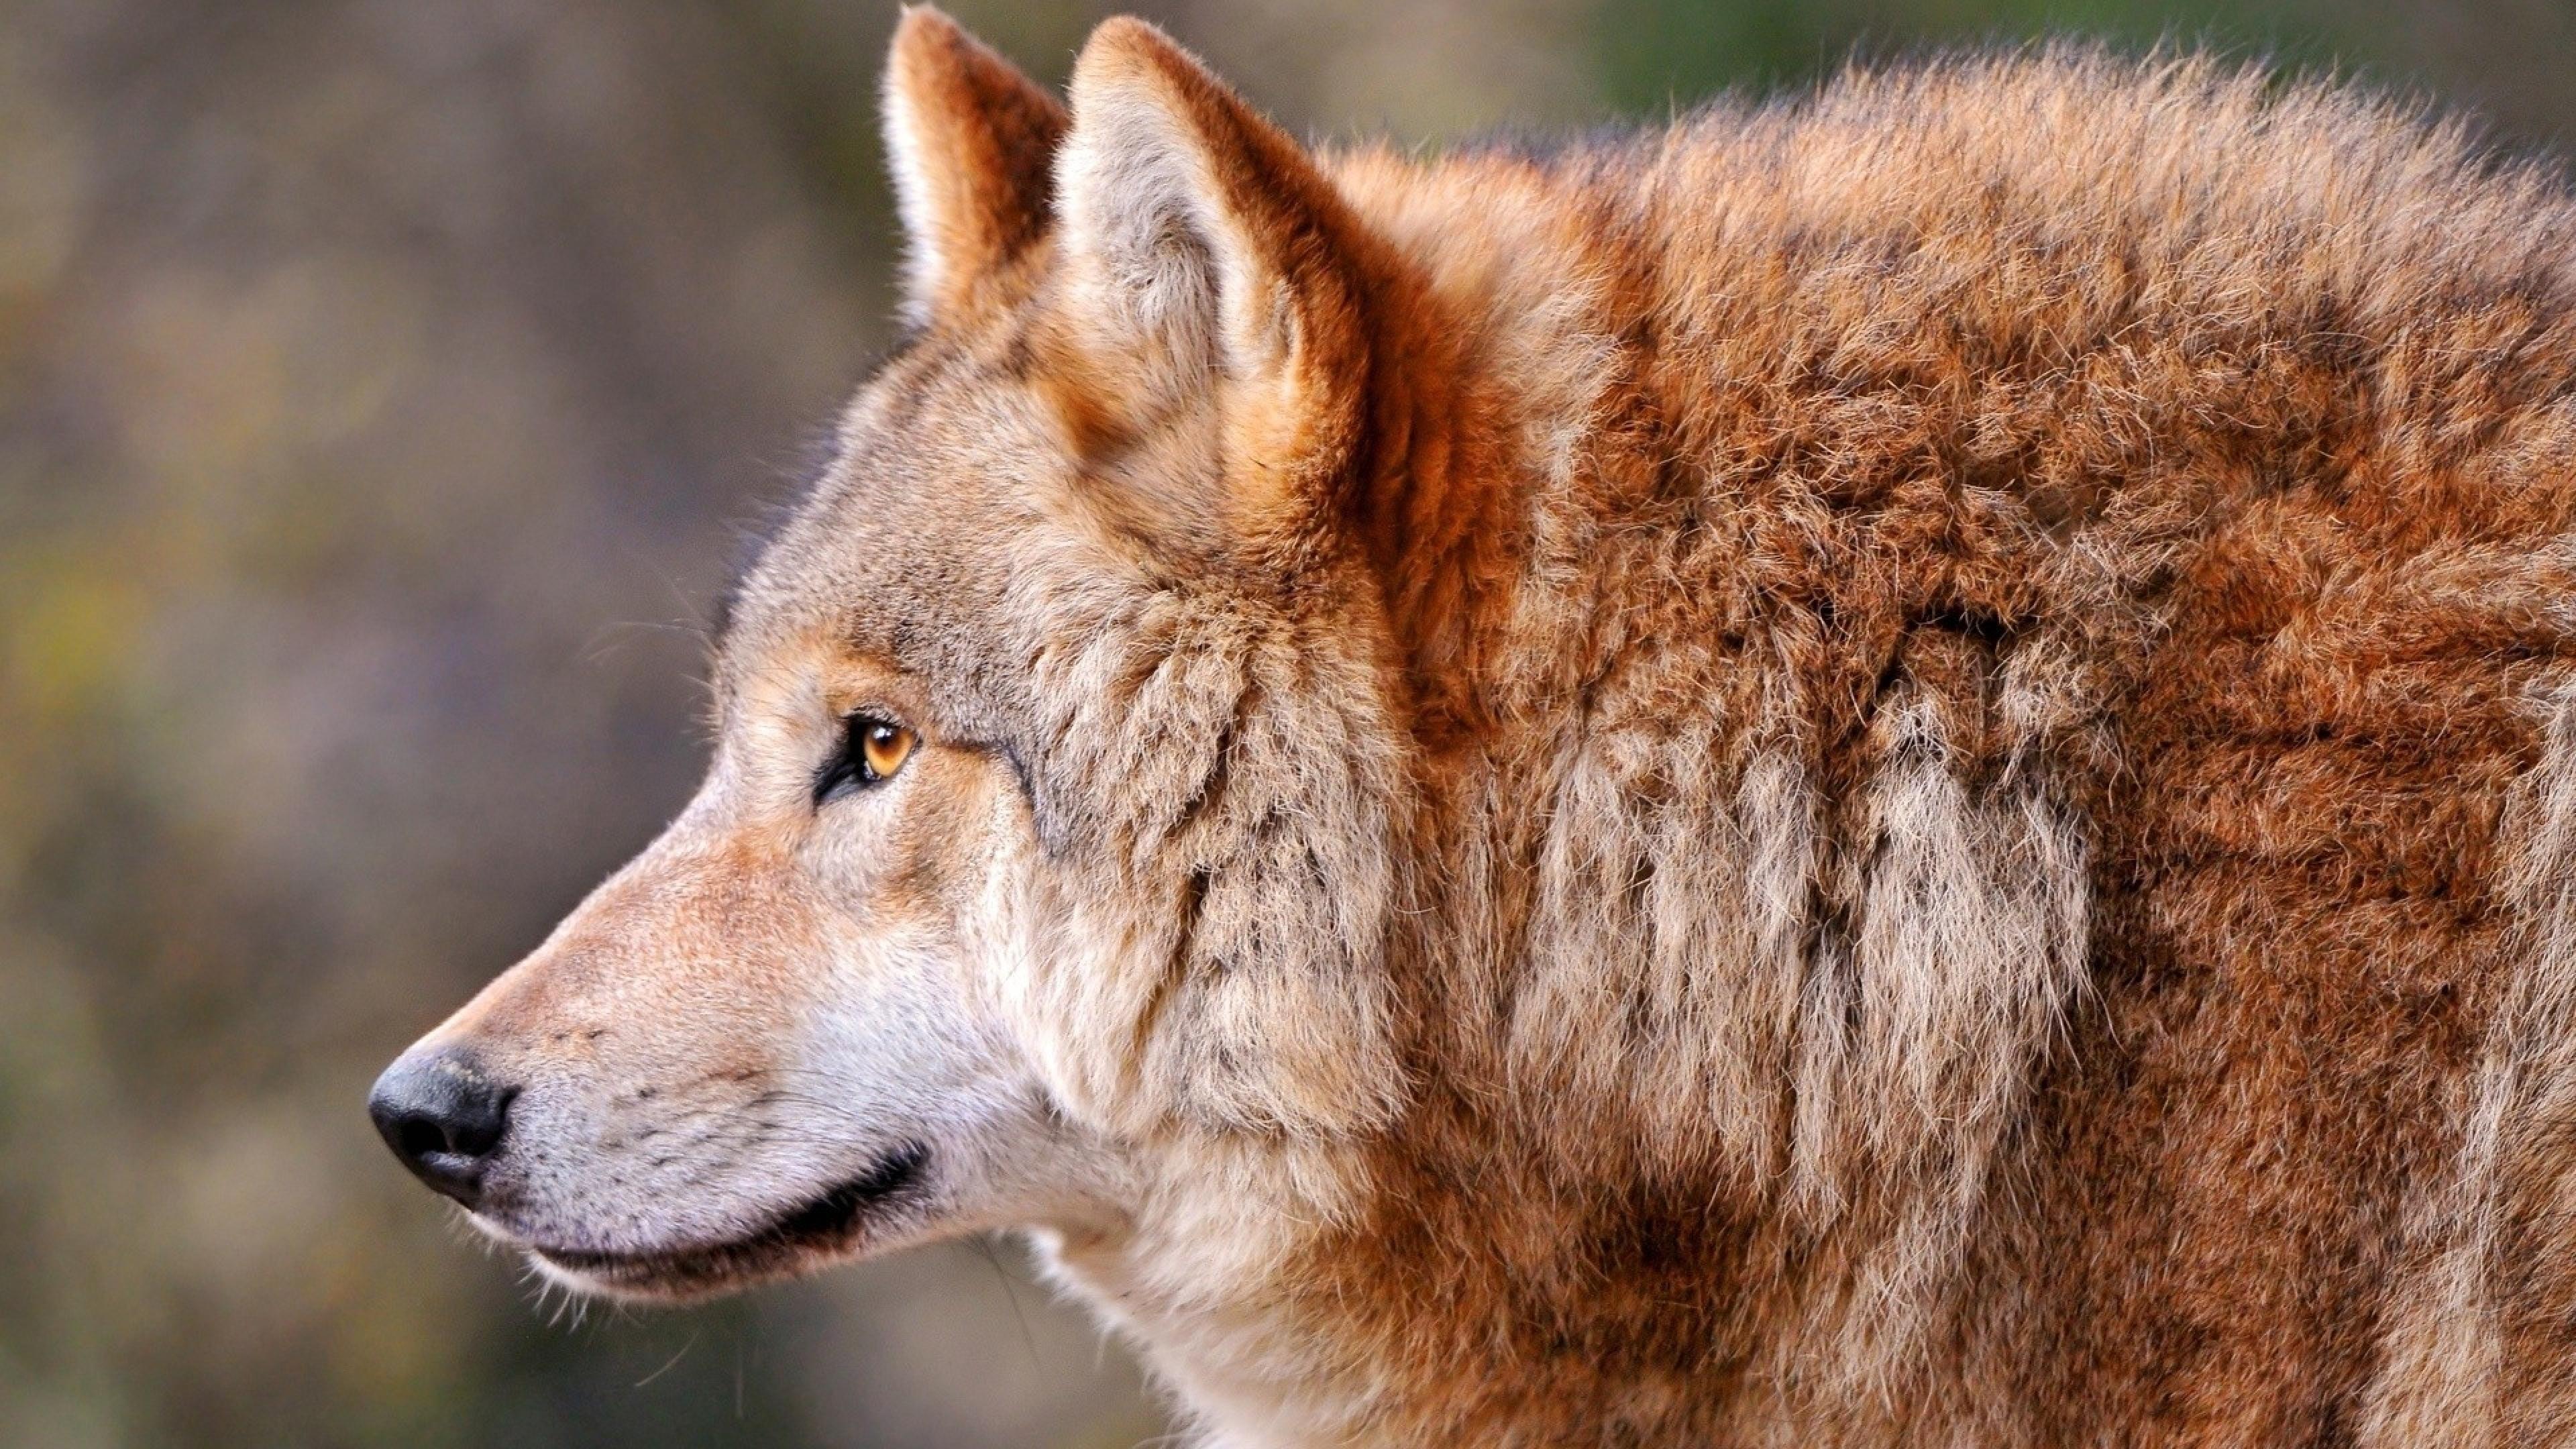 Wolf Profile Animal Predator Dog Wallpaper Background 4K Ultra HD 3840x2160